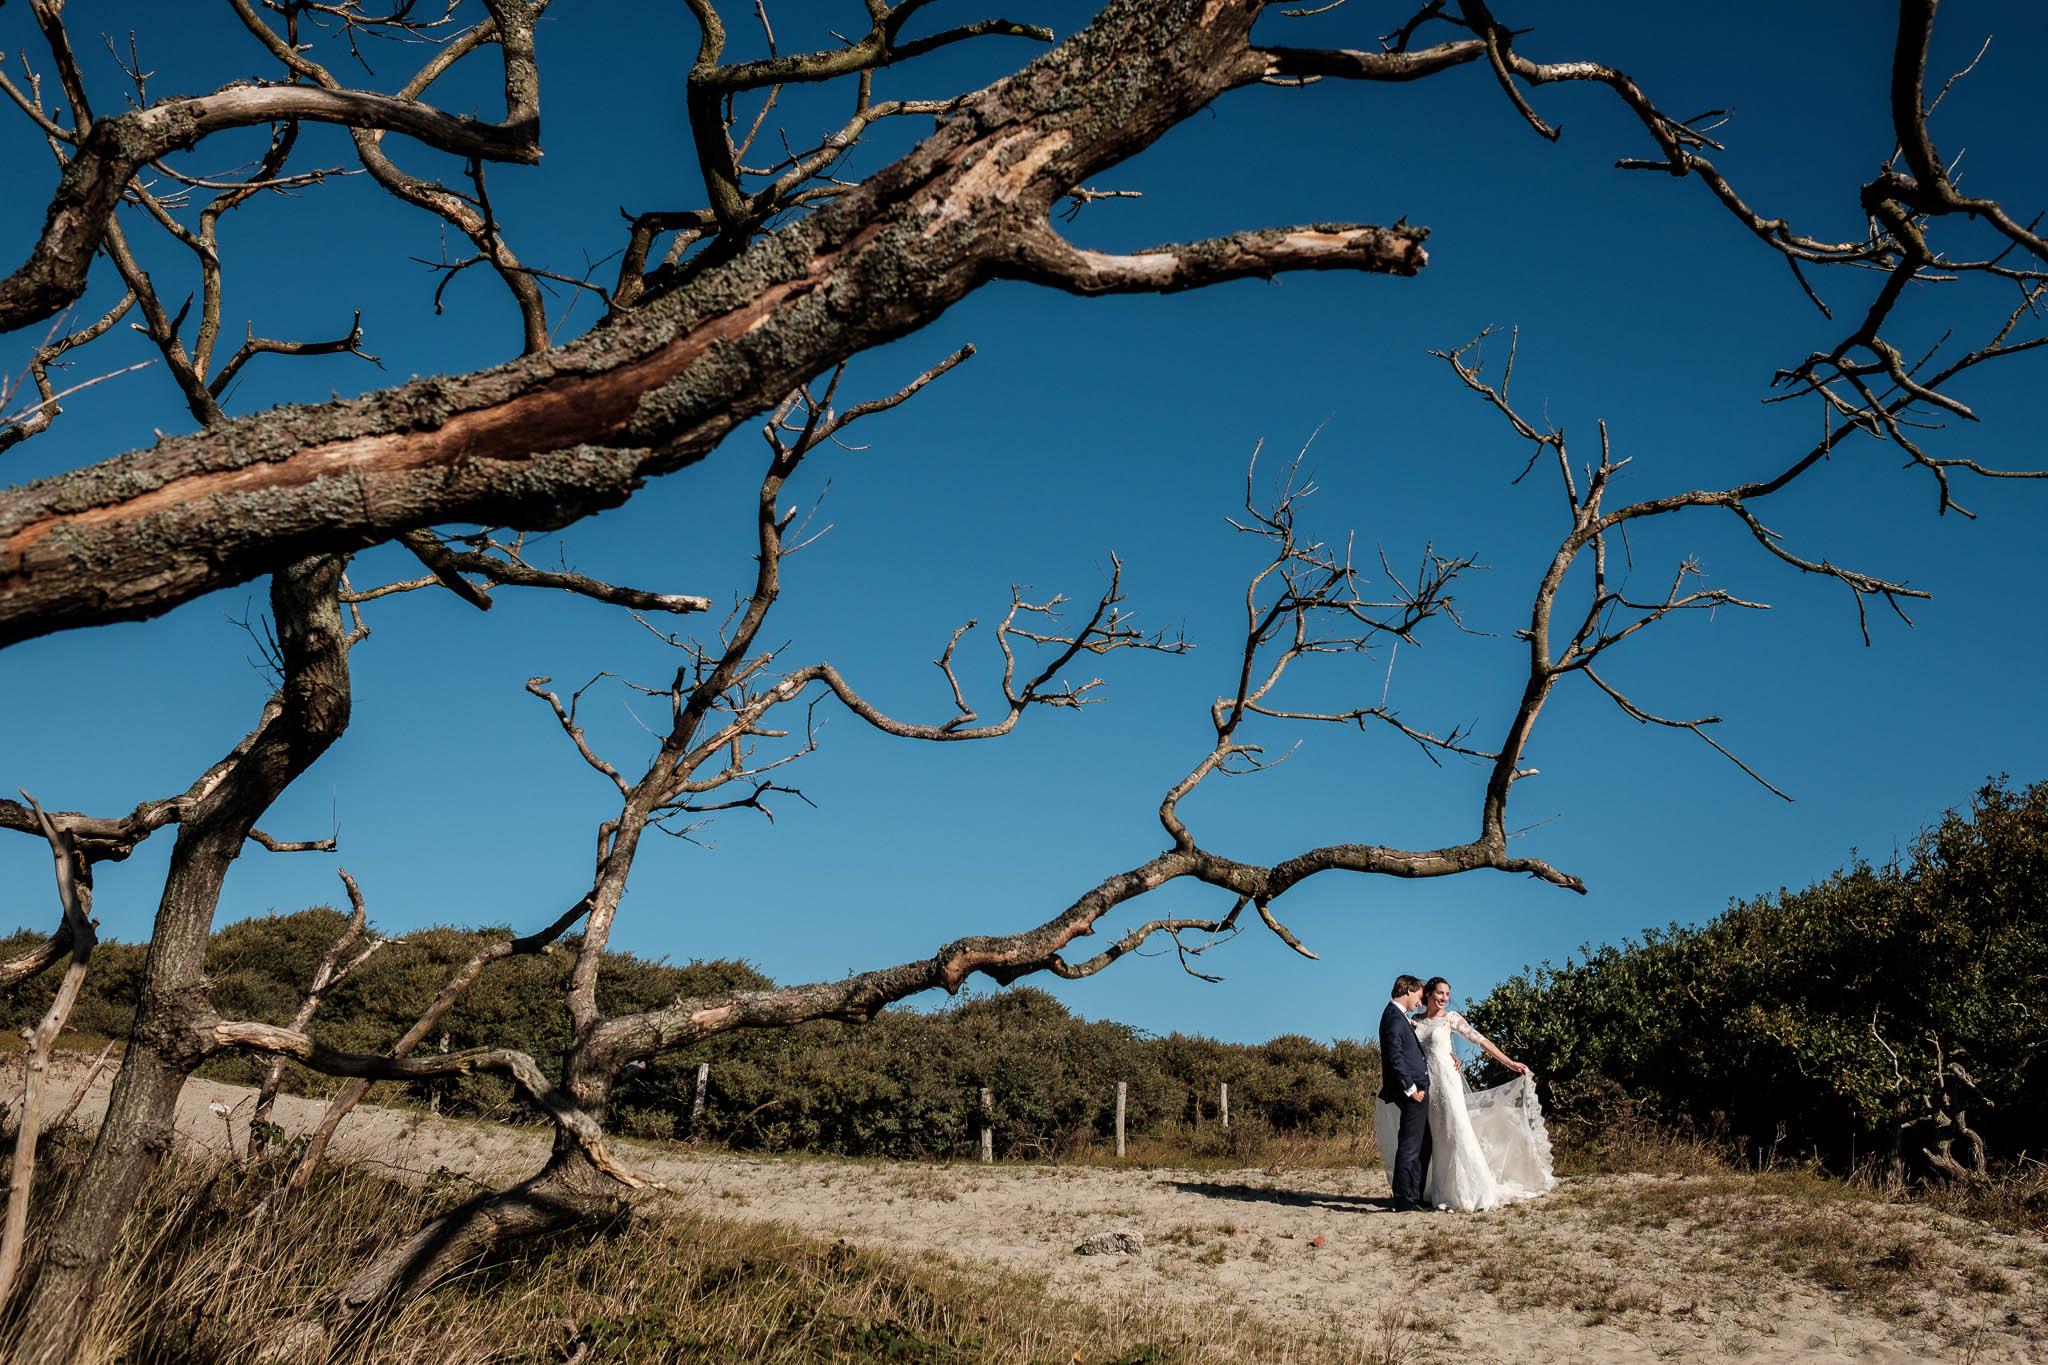 Ontspannen bruidsfotografie - liefdevol en uniek.